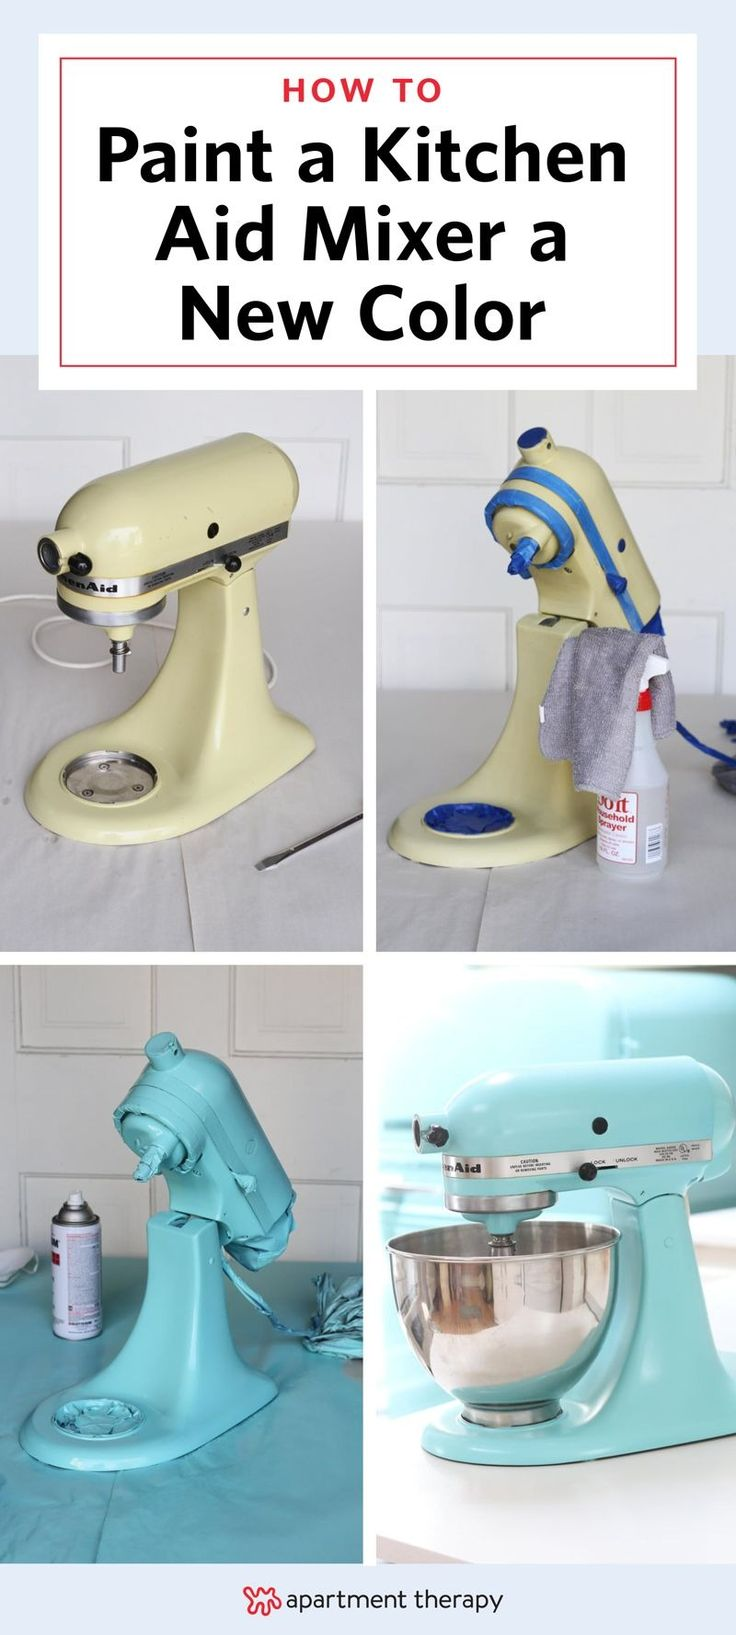 How to paint a kitchenaid mixer a new color kitchen art